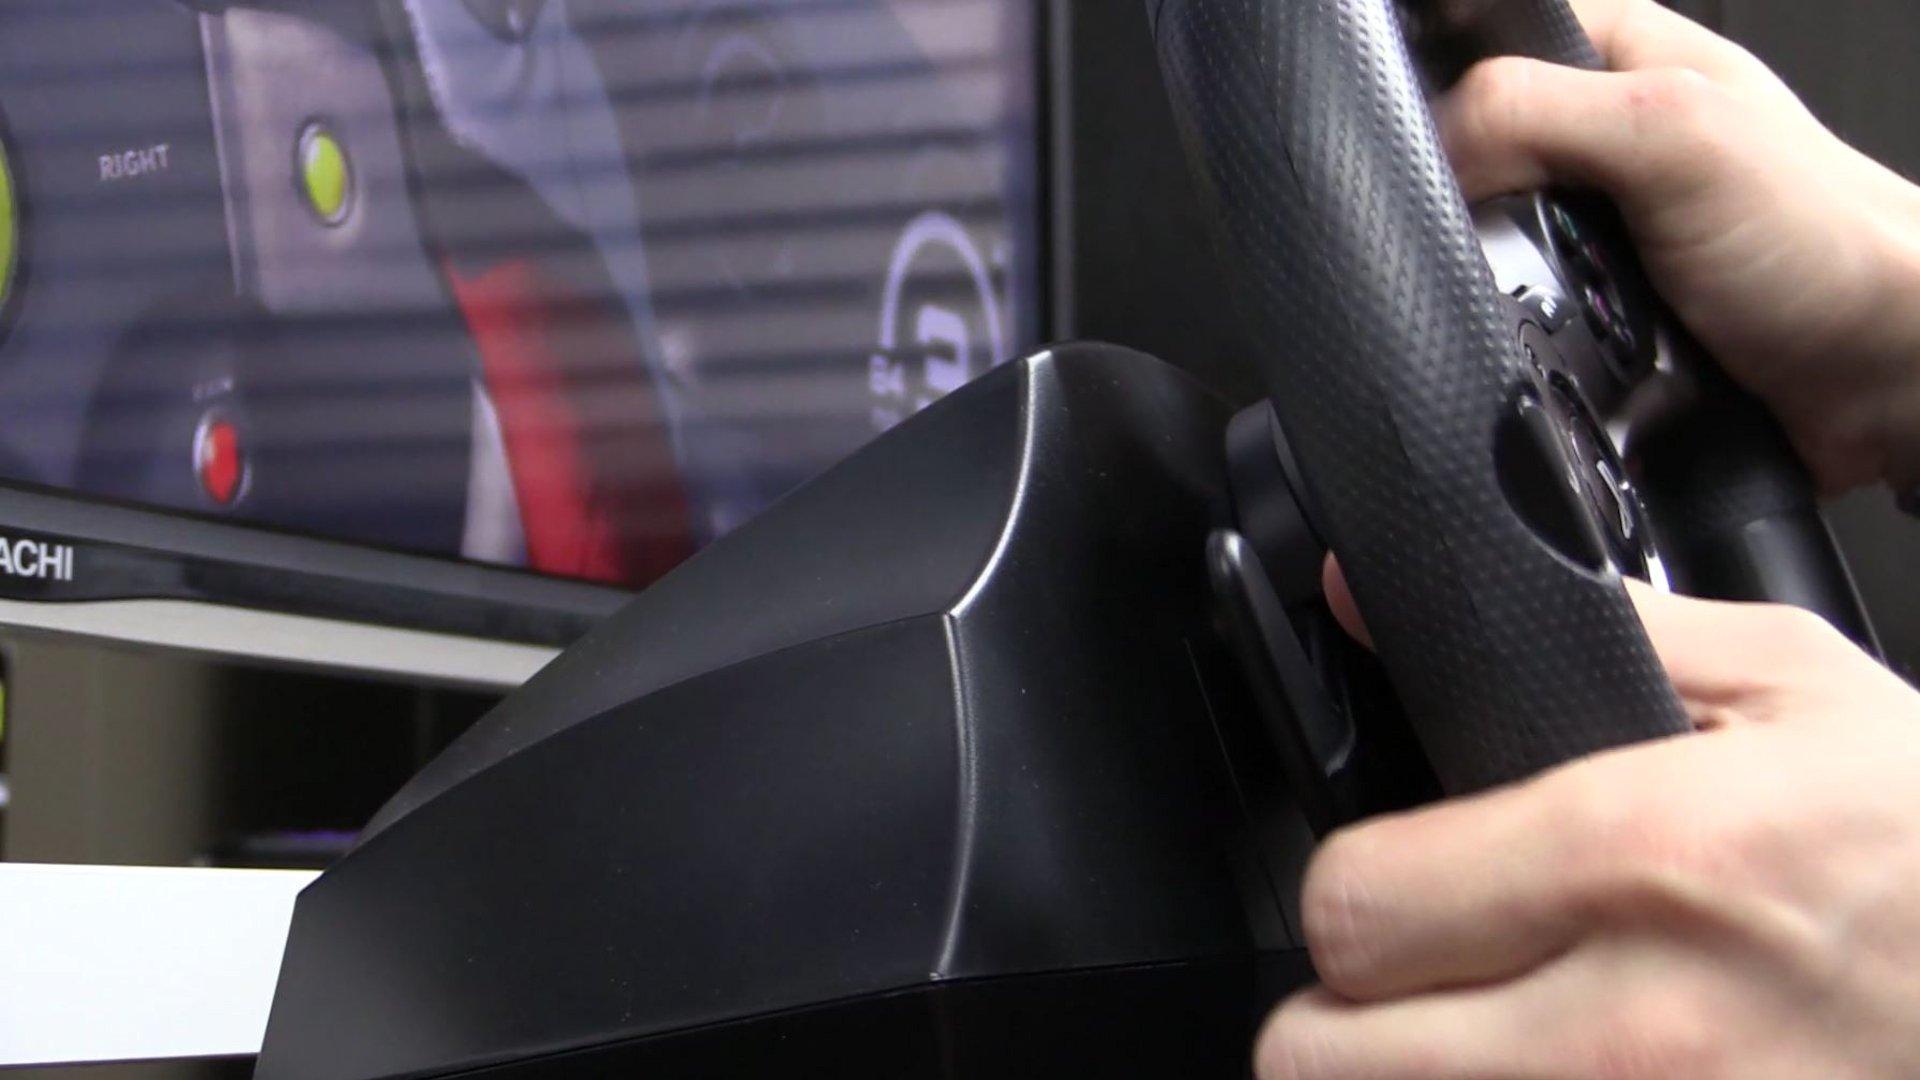 HORI Racing Wheel Apex Review - Is a $99 Wheel a Good Idea? - Inside